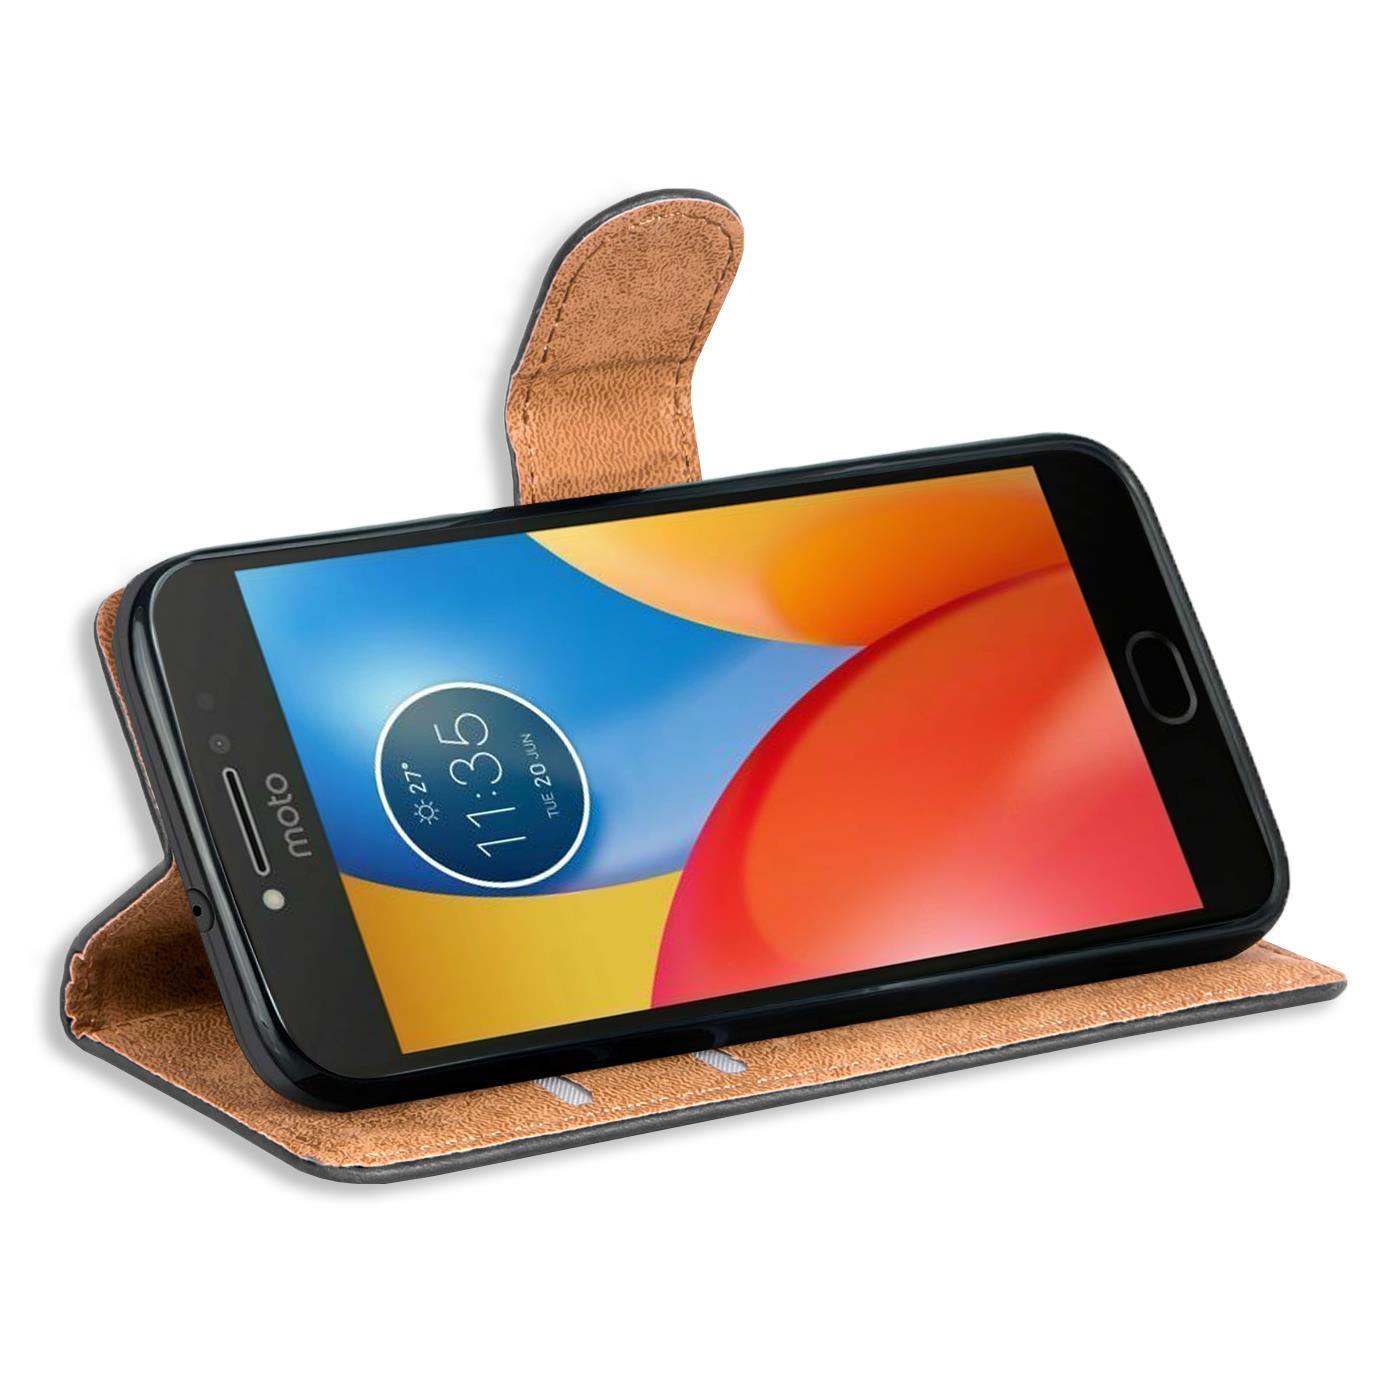 Book-Case-fuer-Motorola-Moto-E4-Huelle-Tasche-Flip-Cover-Handy-Schutz-Huelle Indexbild 10